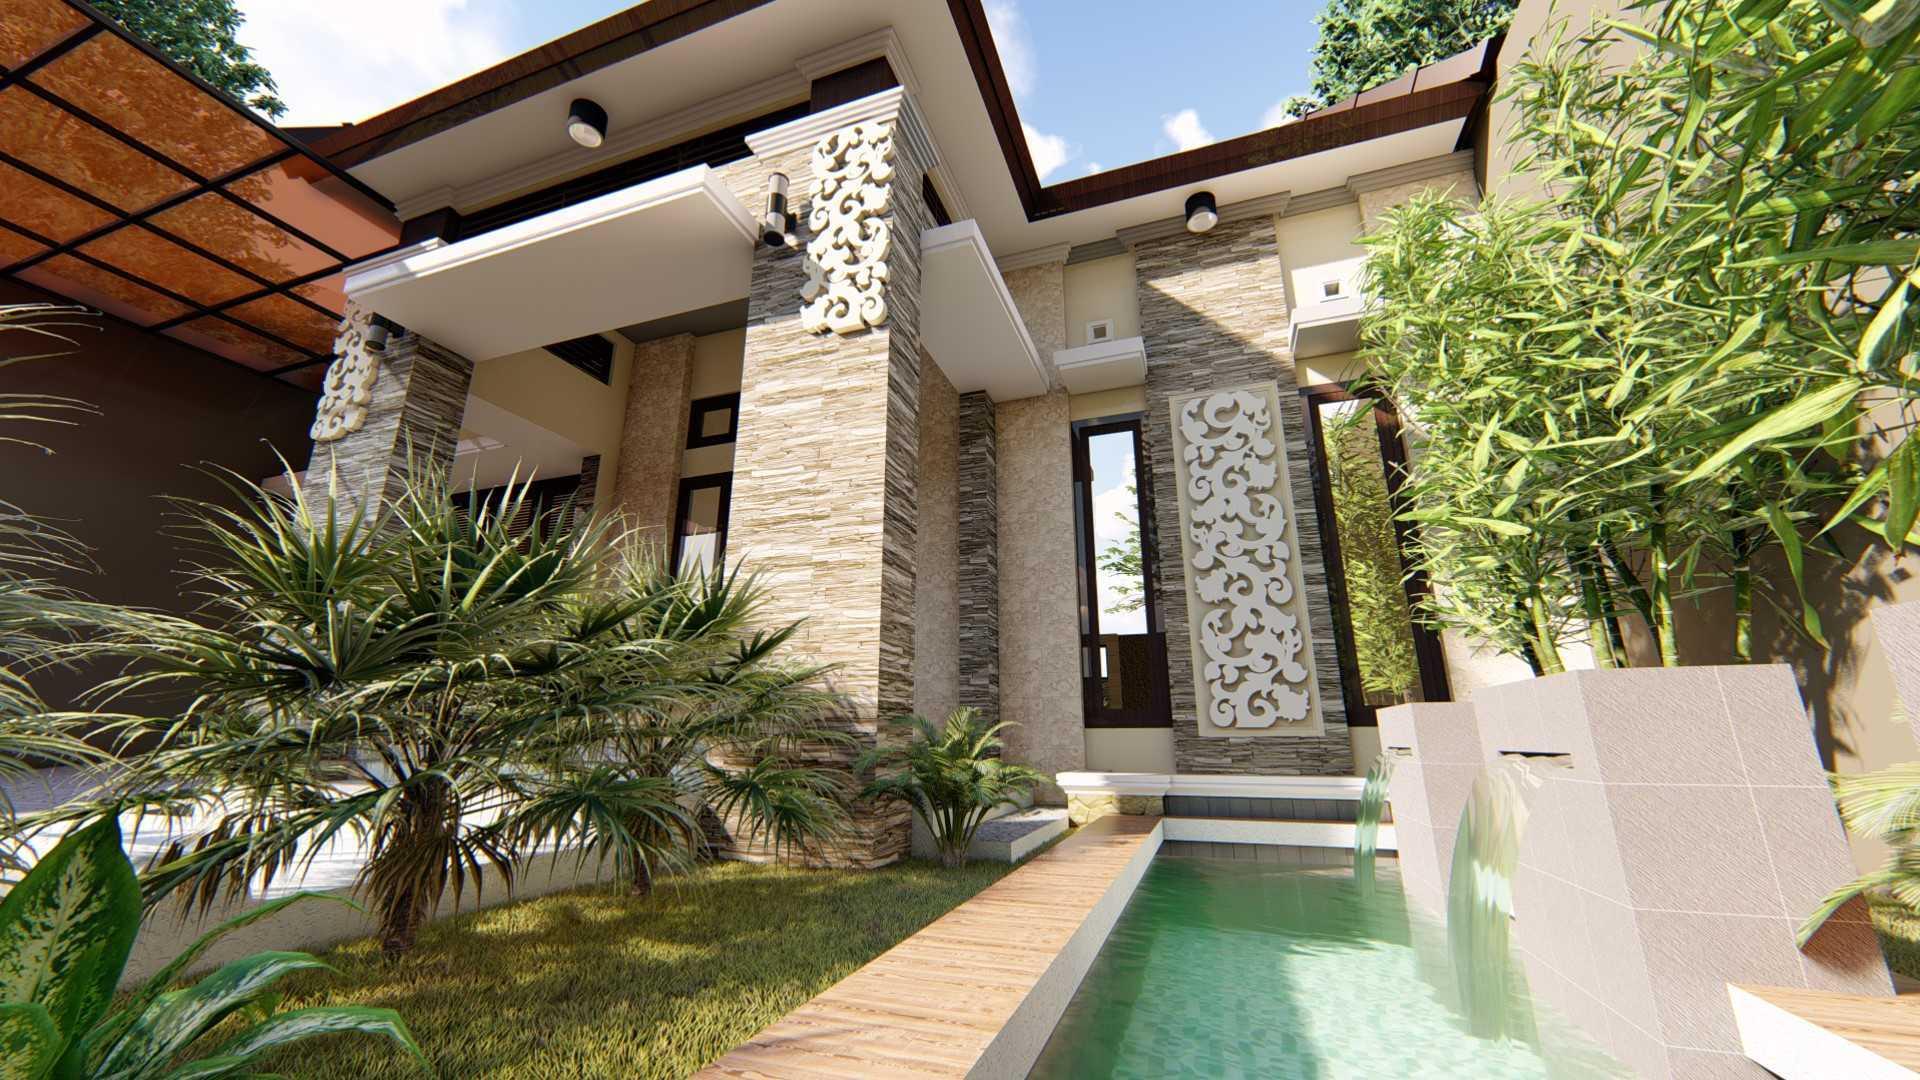 Nggambar Omah   Design And Build The Nusapenida House Blitar, Jawa Timur, Indonesia Blitar, Jawa Timur, Indonesia Fasad Depan  57042